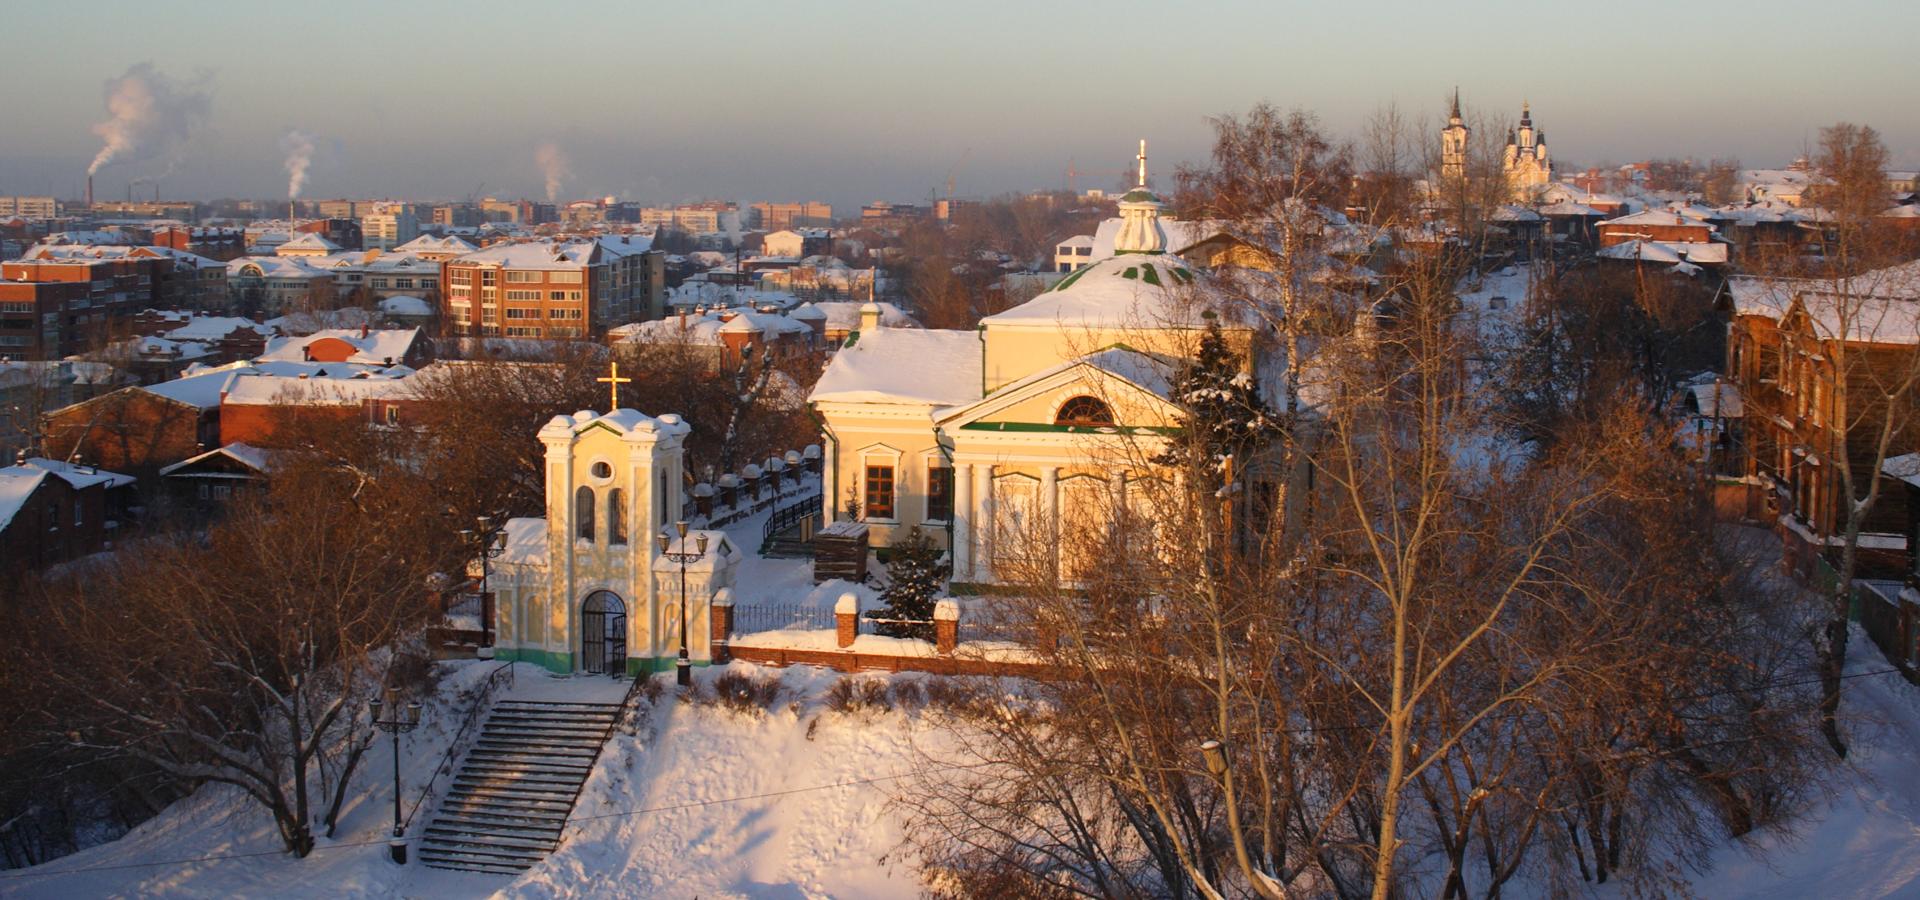 Peer-to-peer advisory in Tomsk, Tomsk Oblast, Siberia, Russia